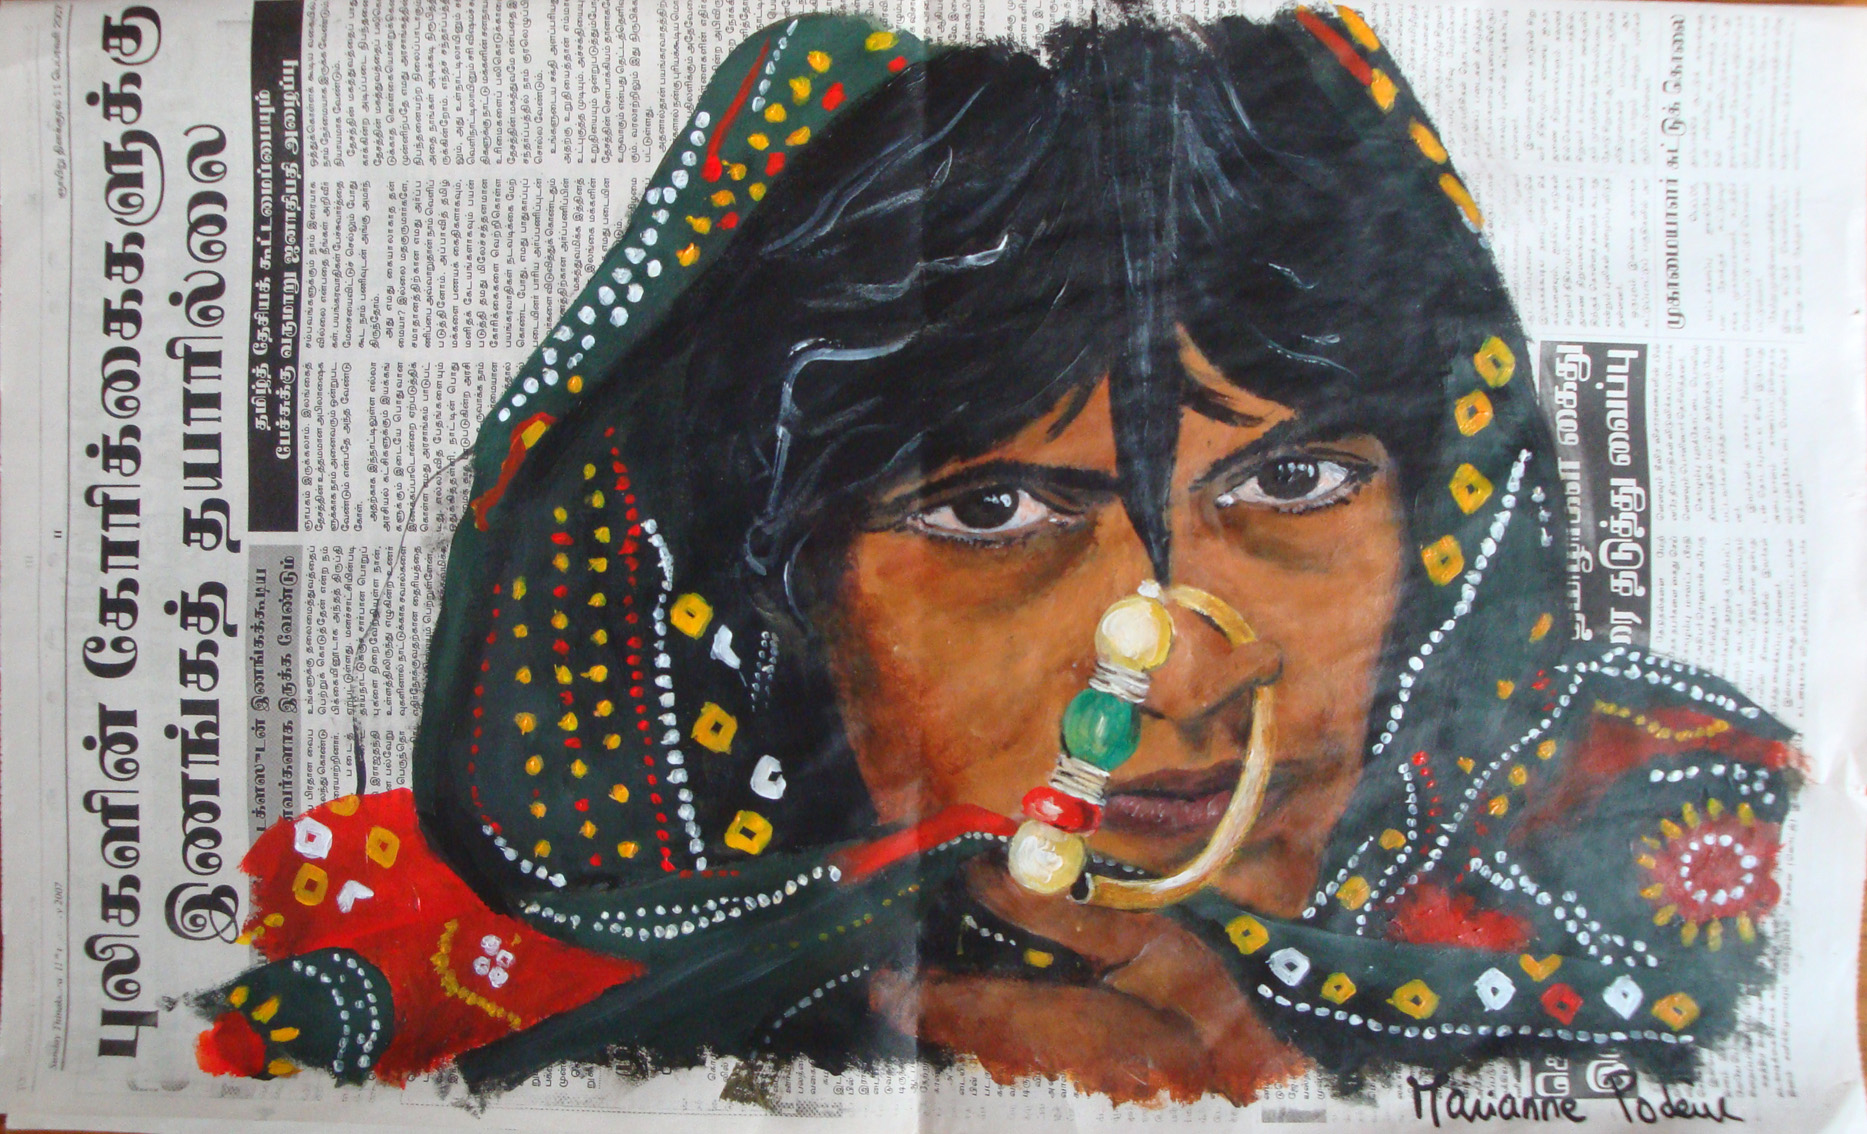 INDE - La tribu Jat